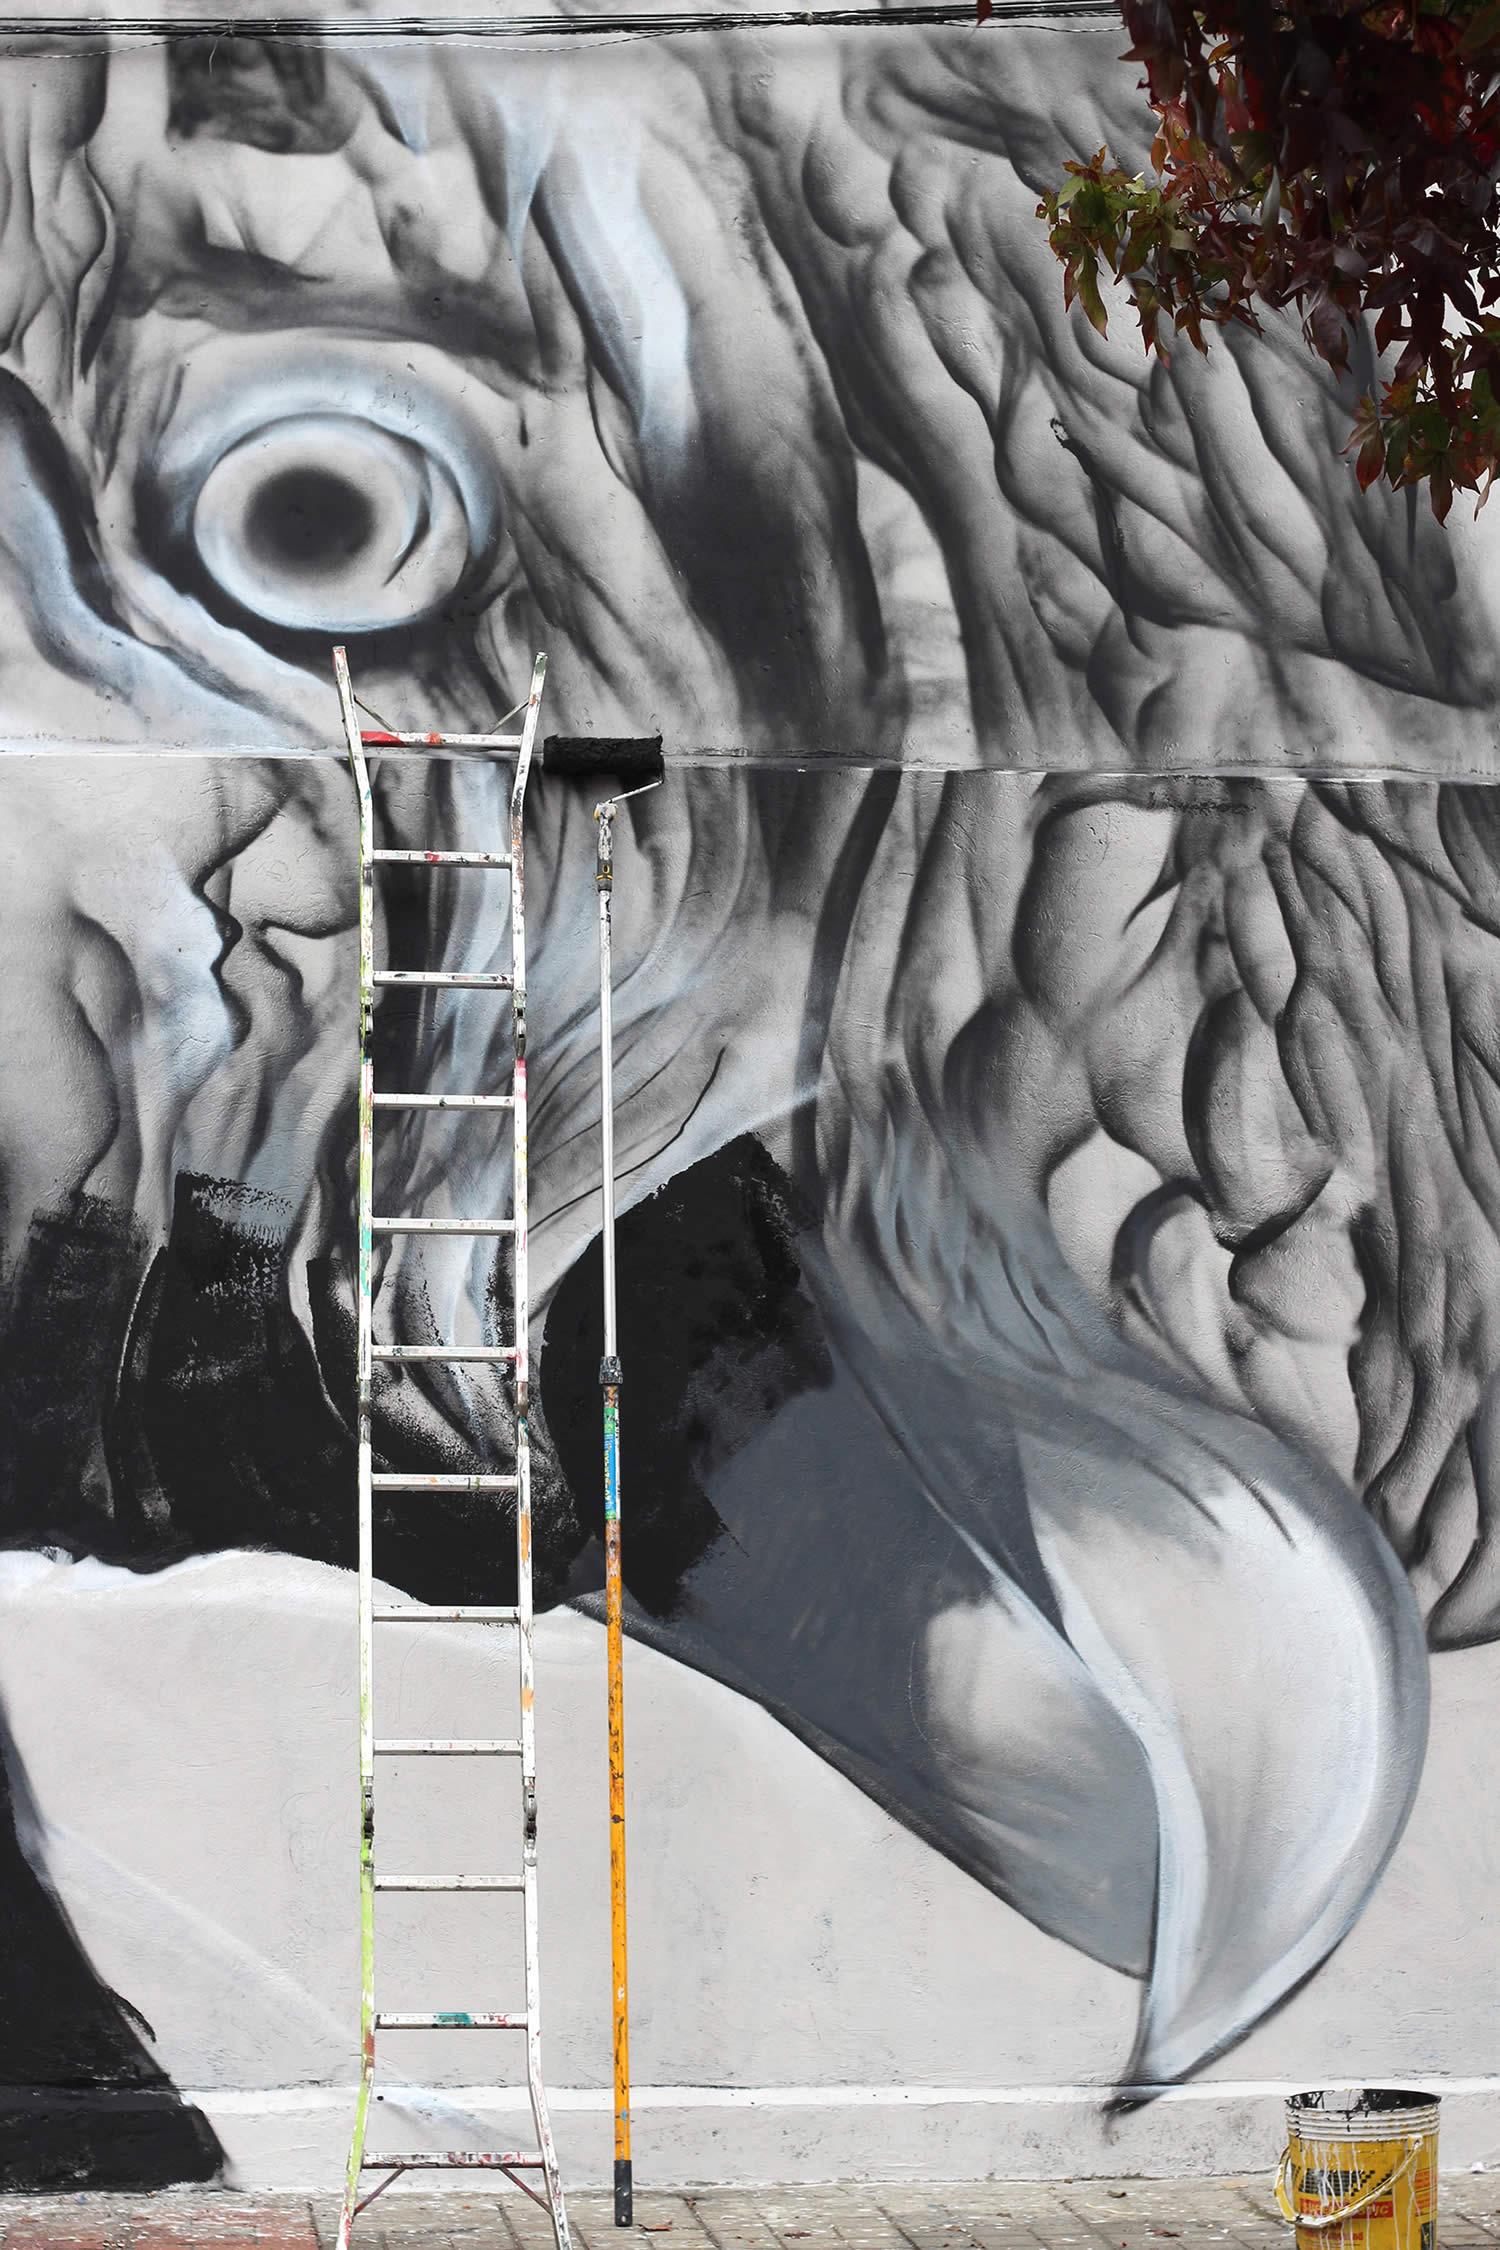 closeup of parrot, graffiti by mantra rea